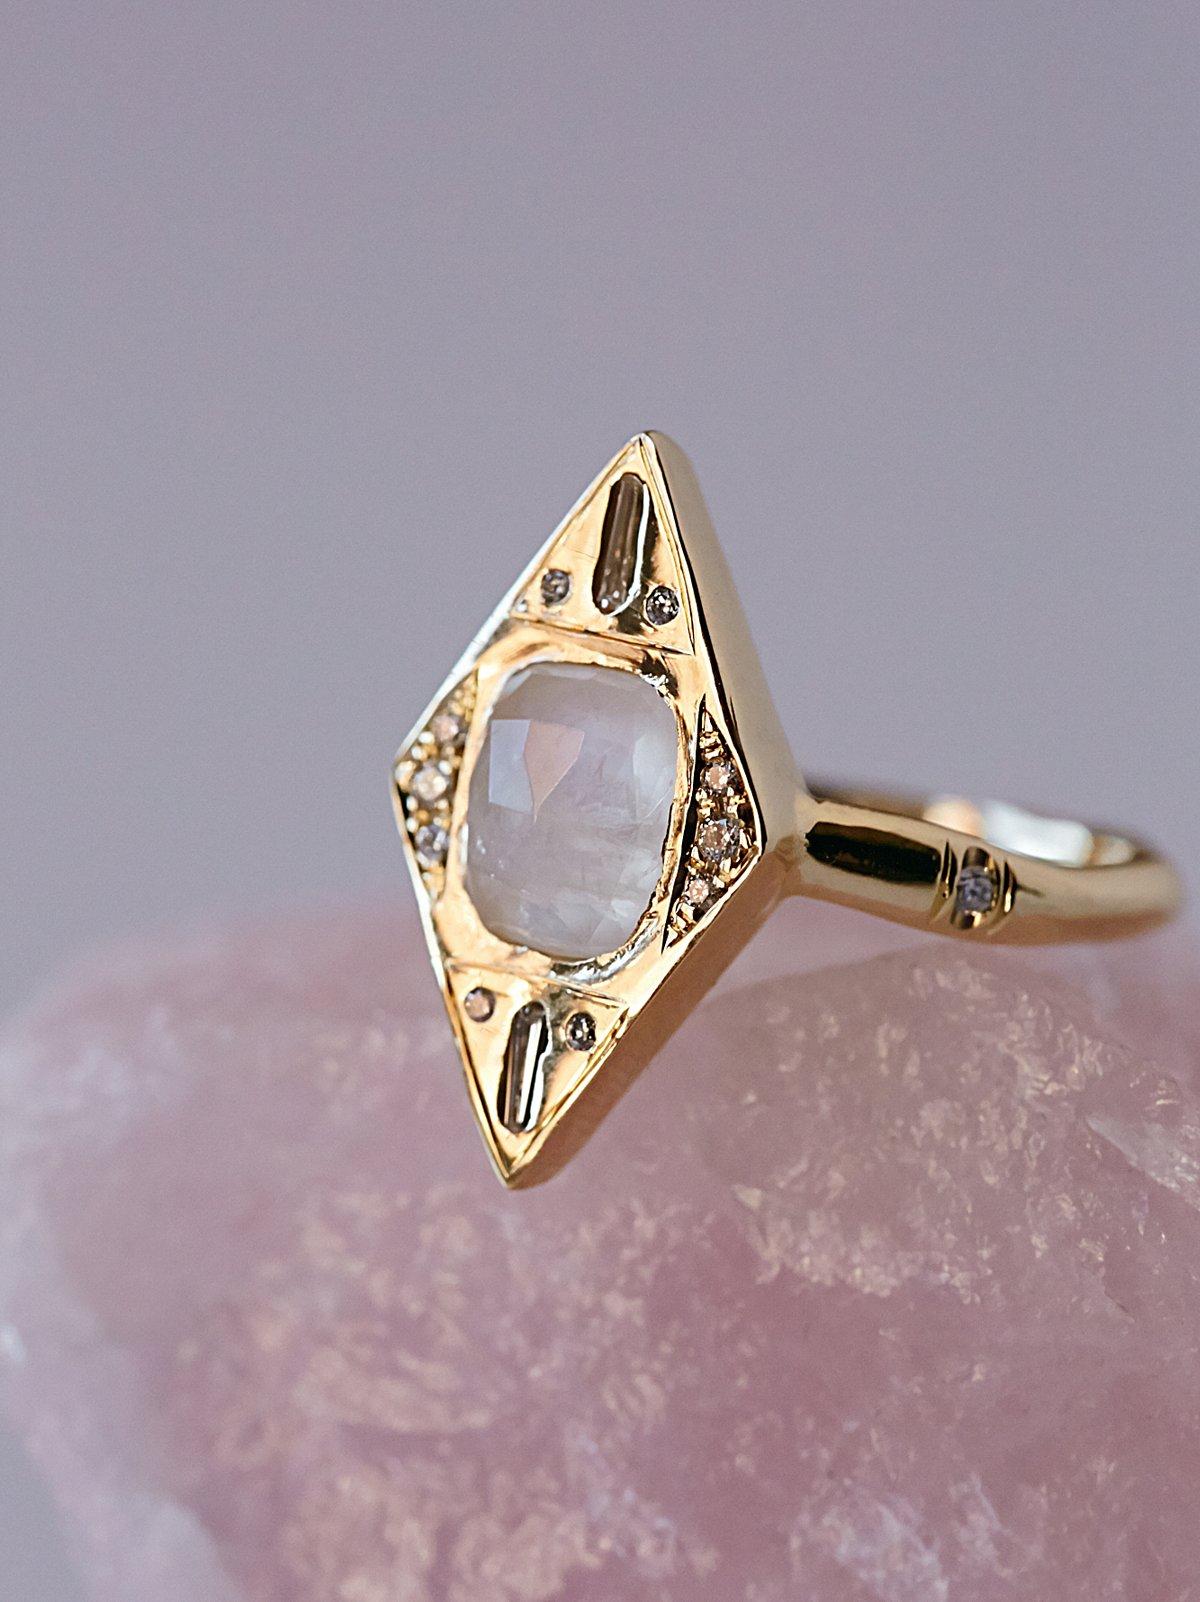 14k Envy钻石戒指